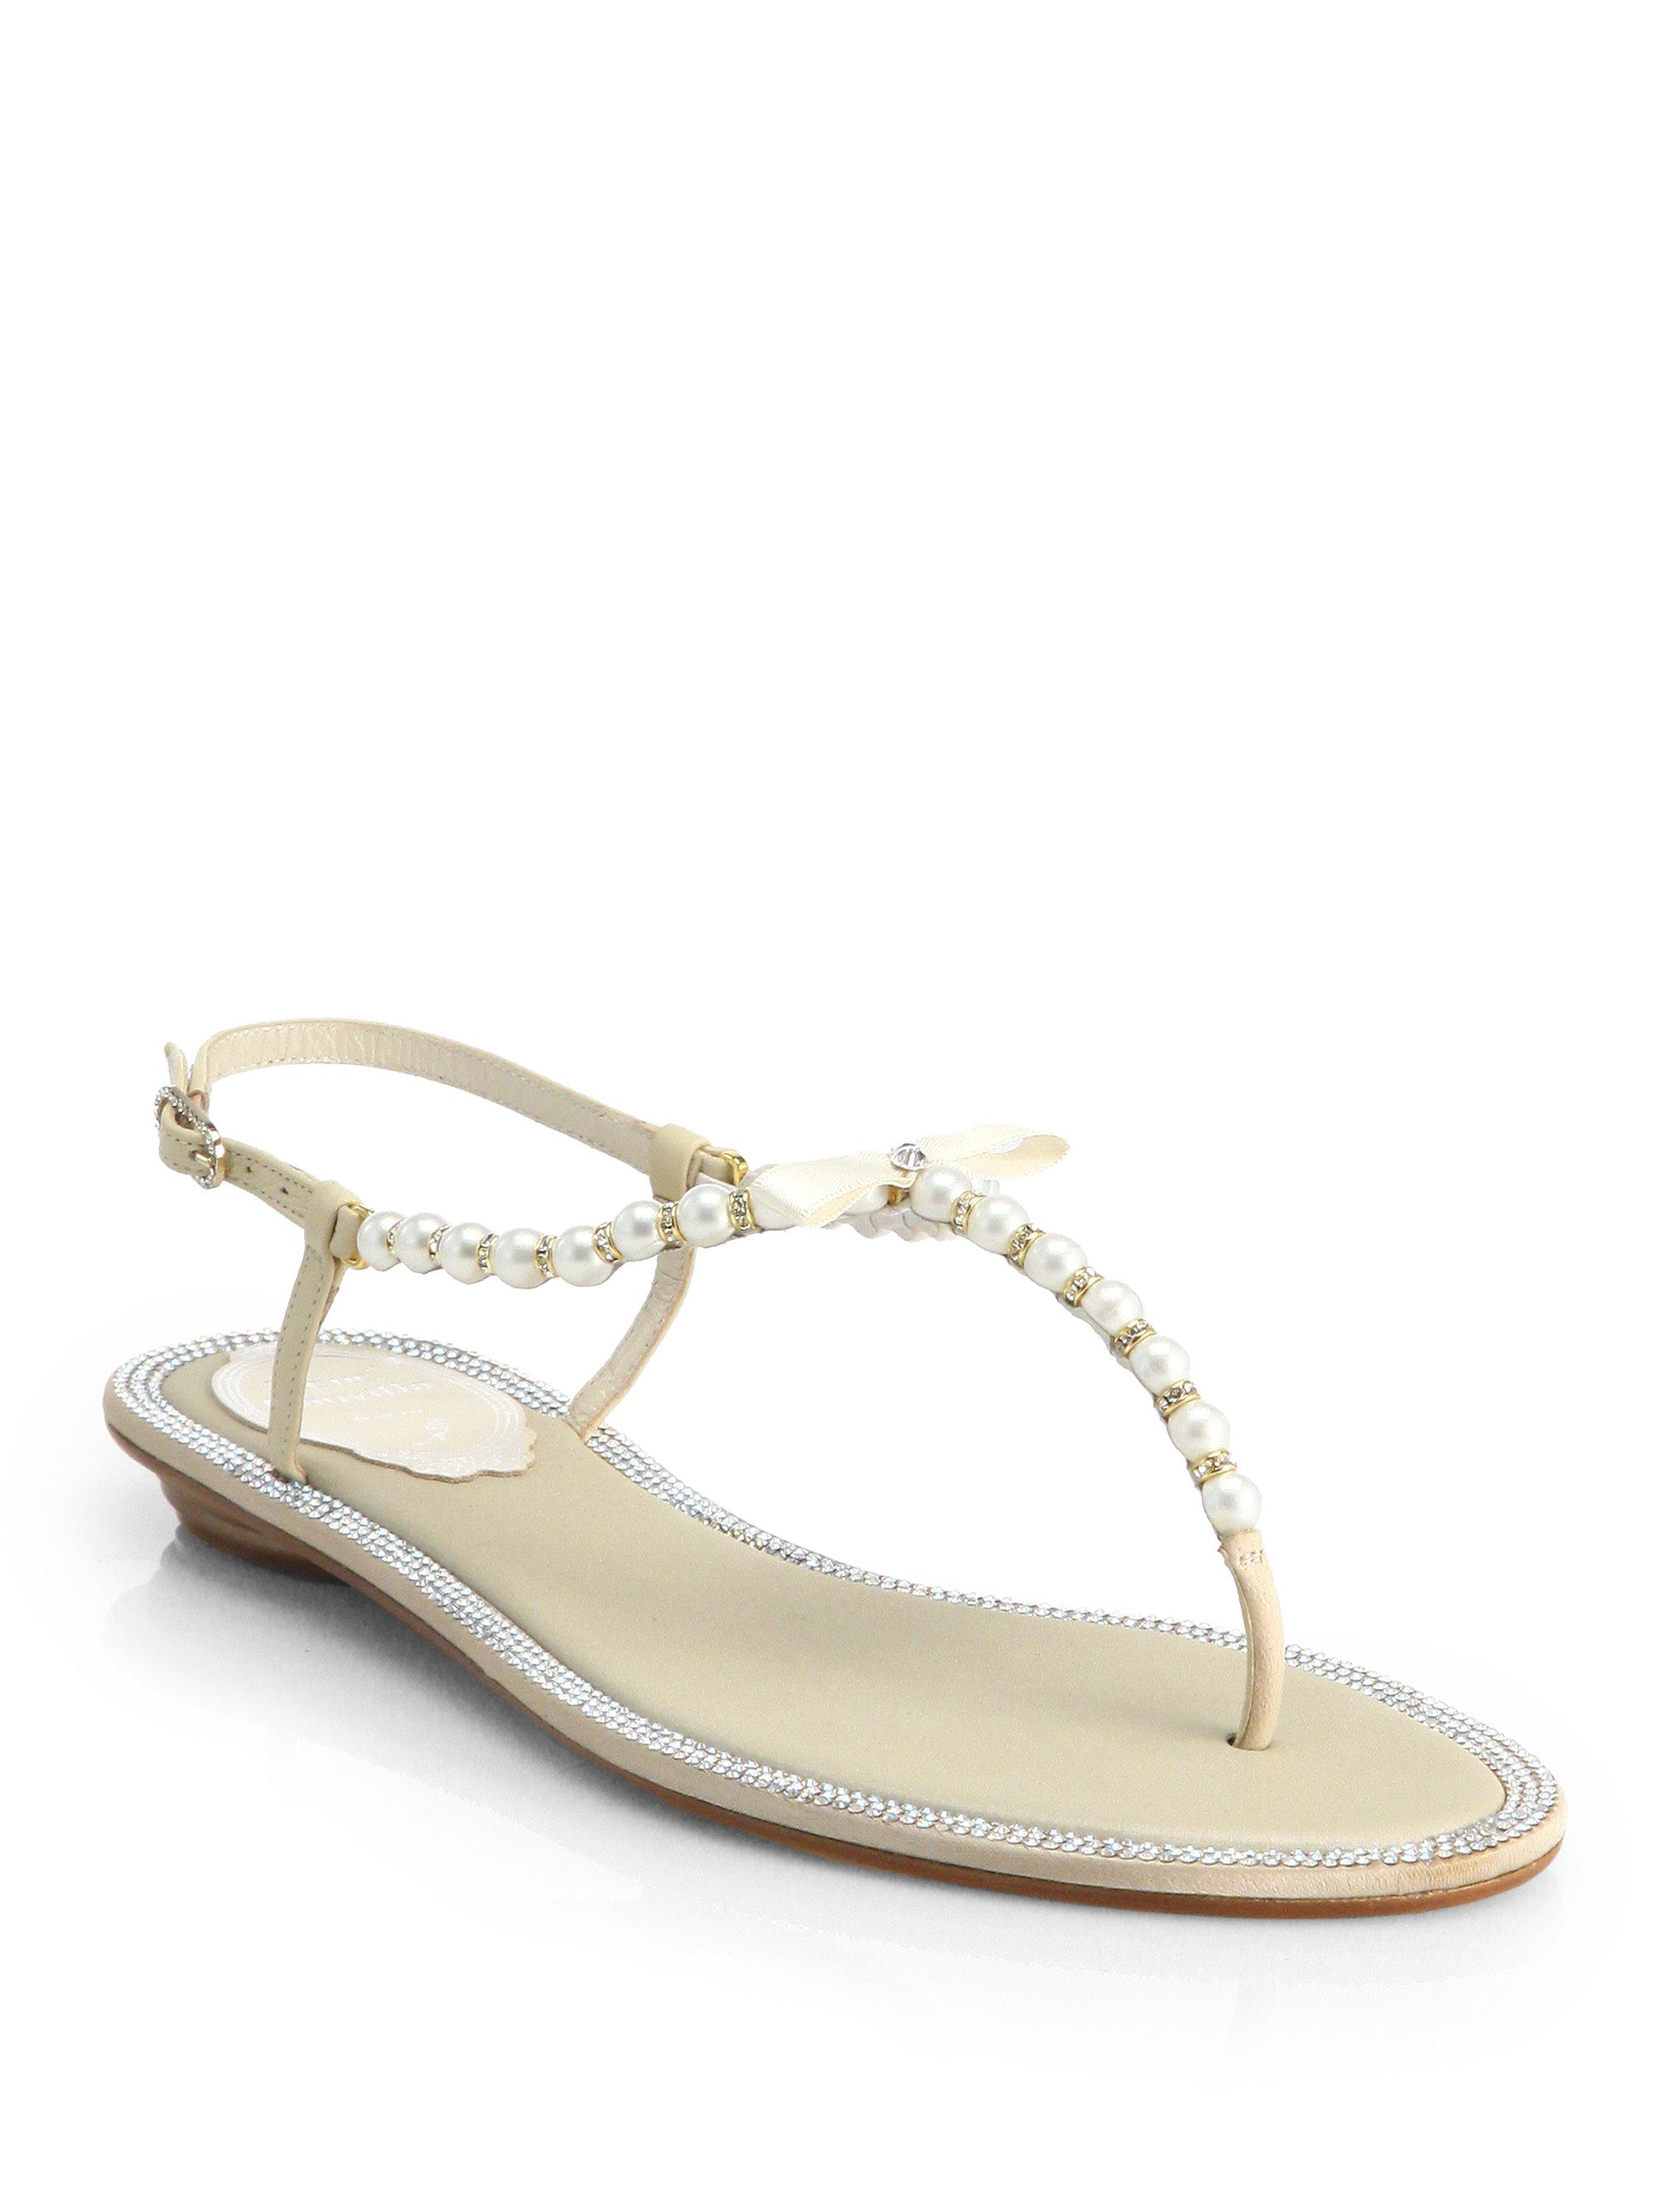 René Caovilla Faux-Pearl Embellished Sandals free shipping choice Yu4wF